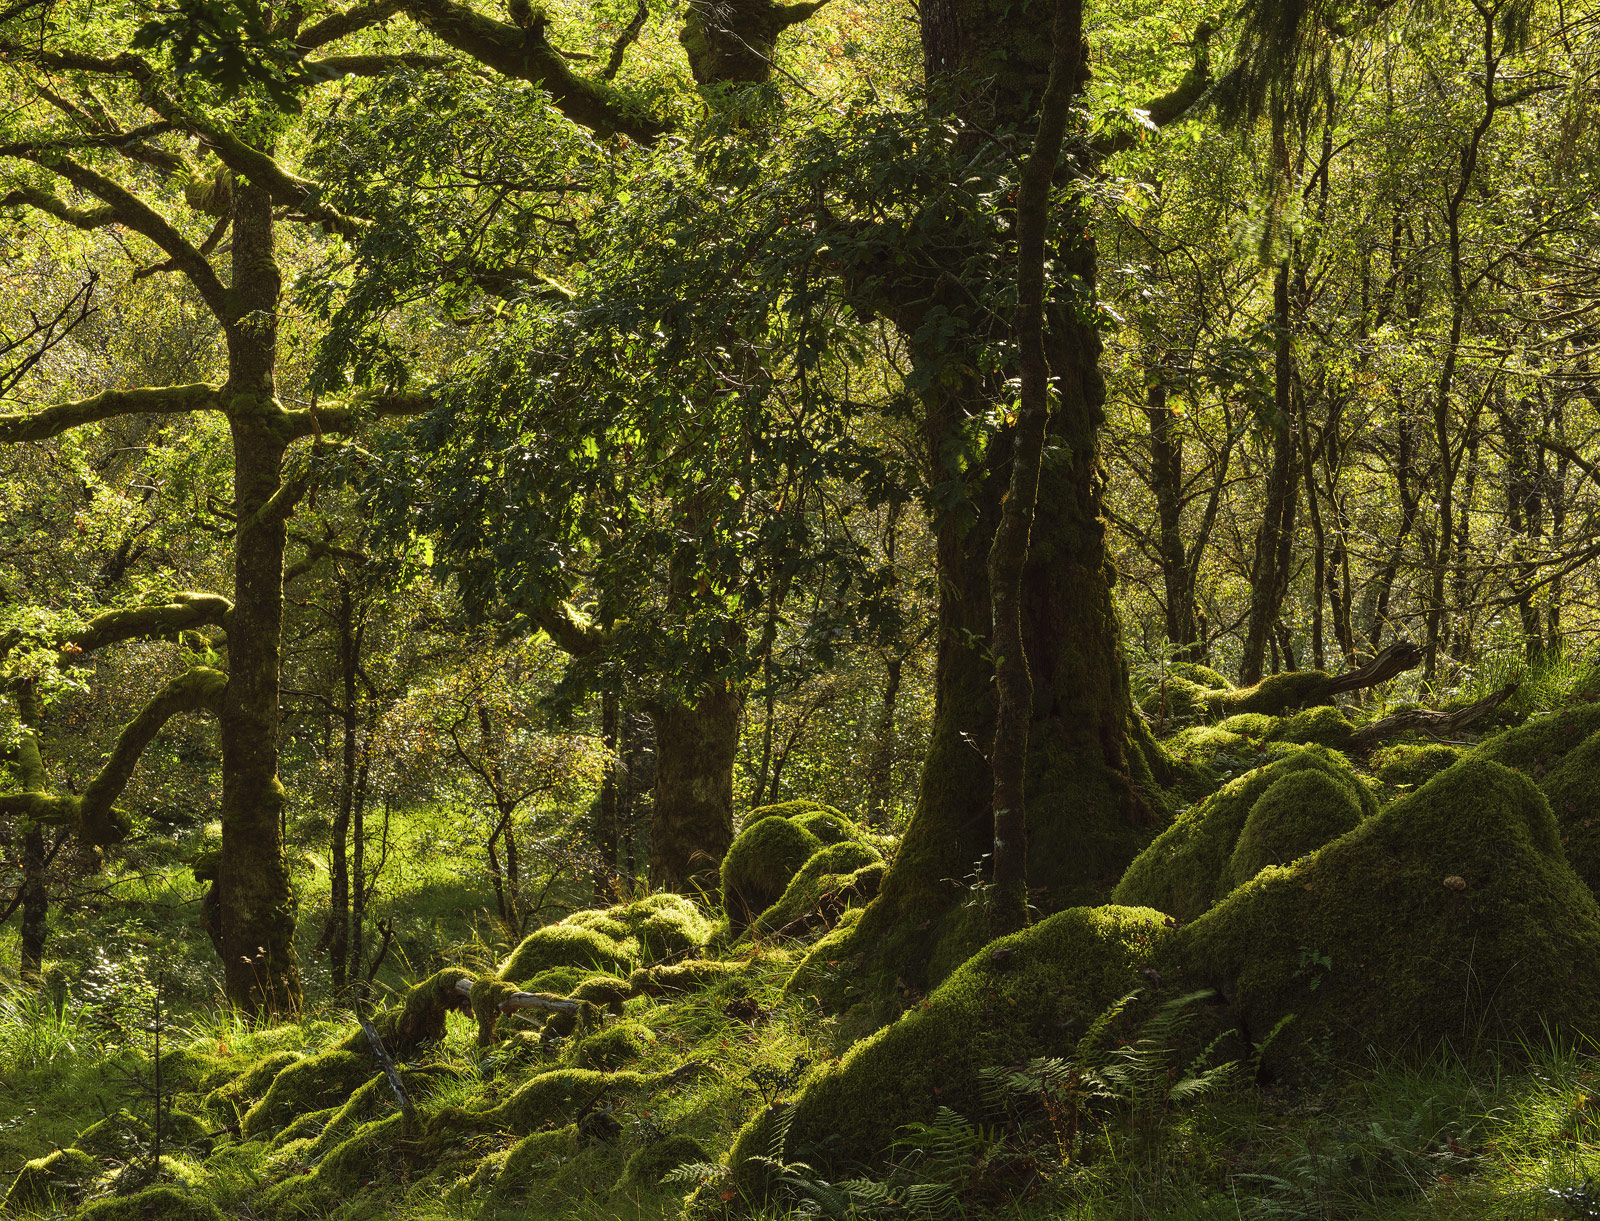 Emerald Oakwood, Ariundle Woods, Ardnamurchan, Scotland, ancient, sessile, ferns, moss, lichen, dappled, golden, backlit, photo